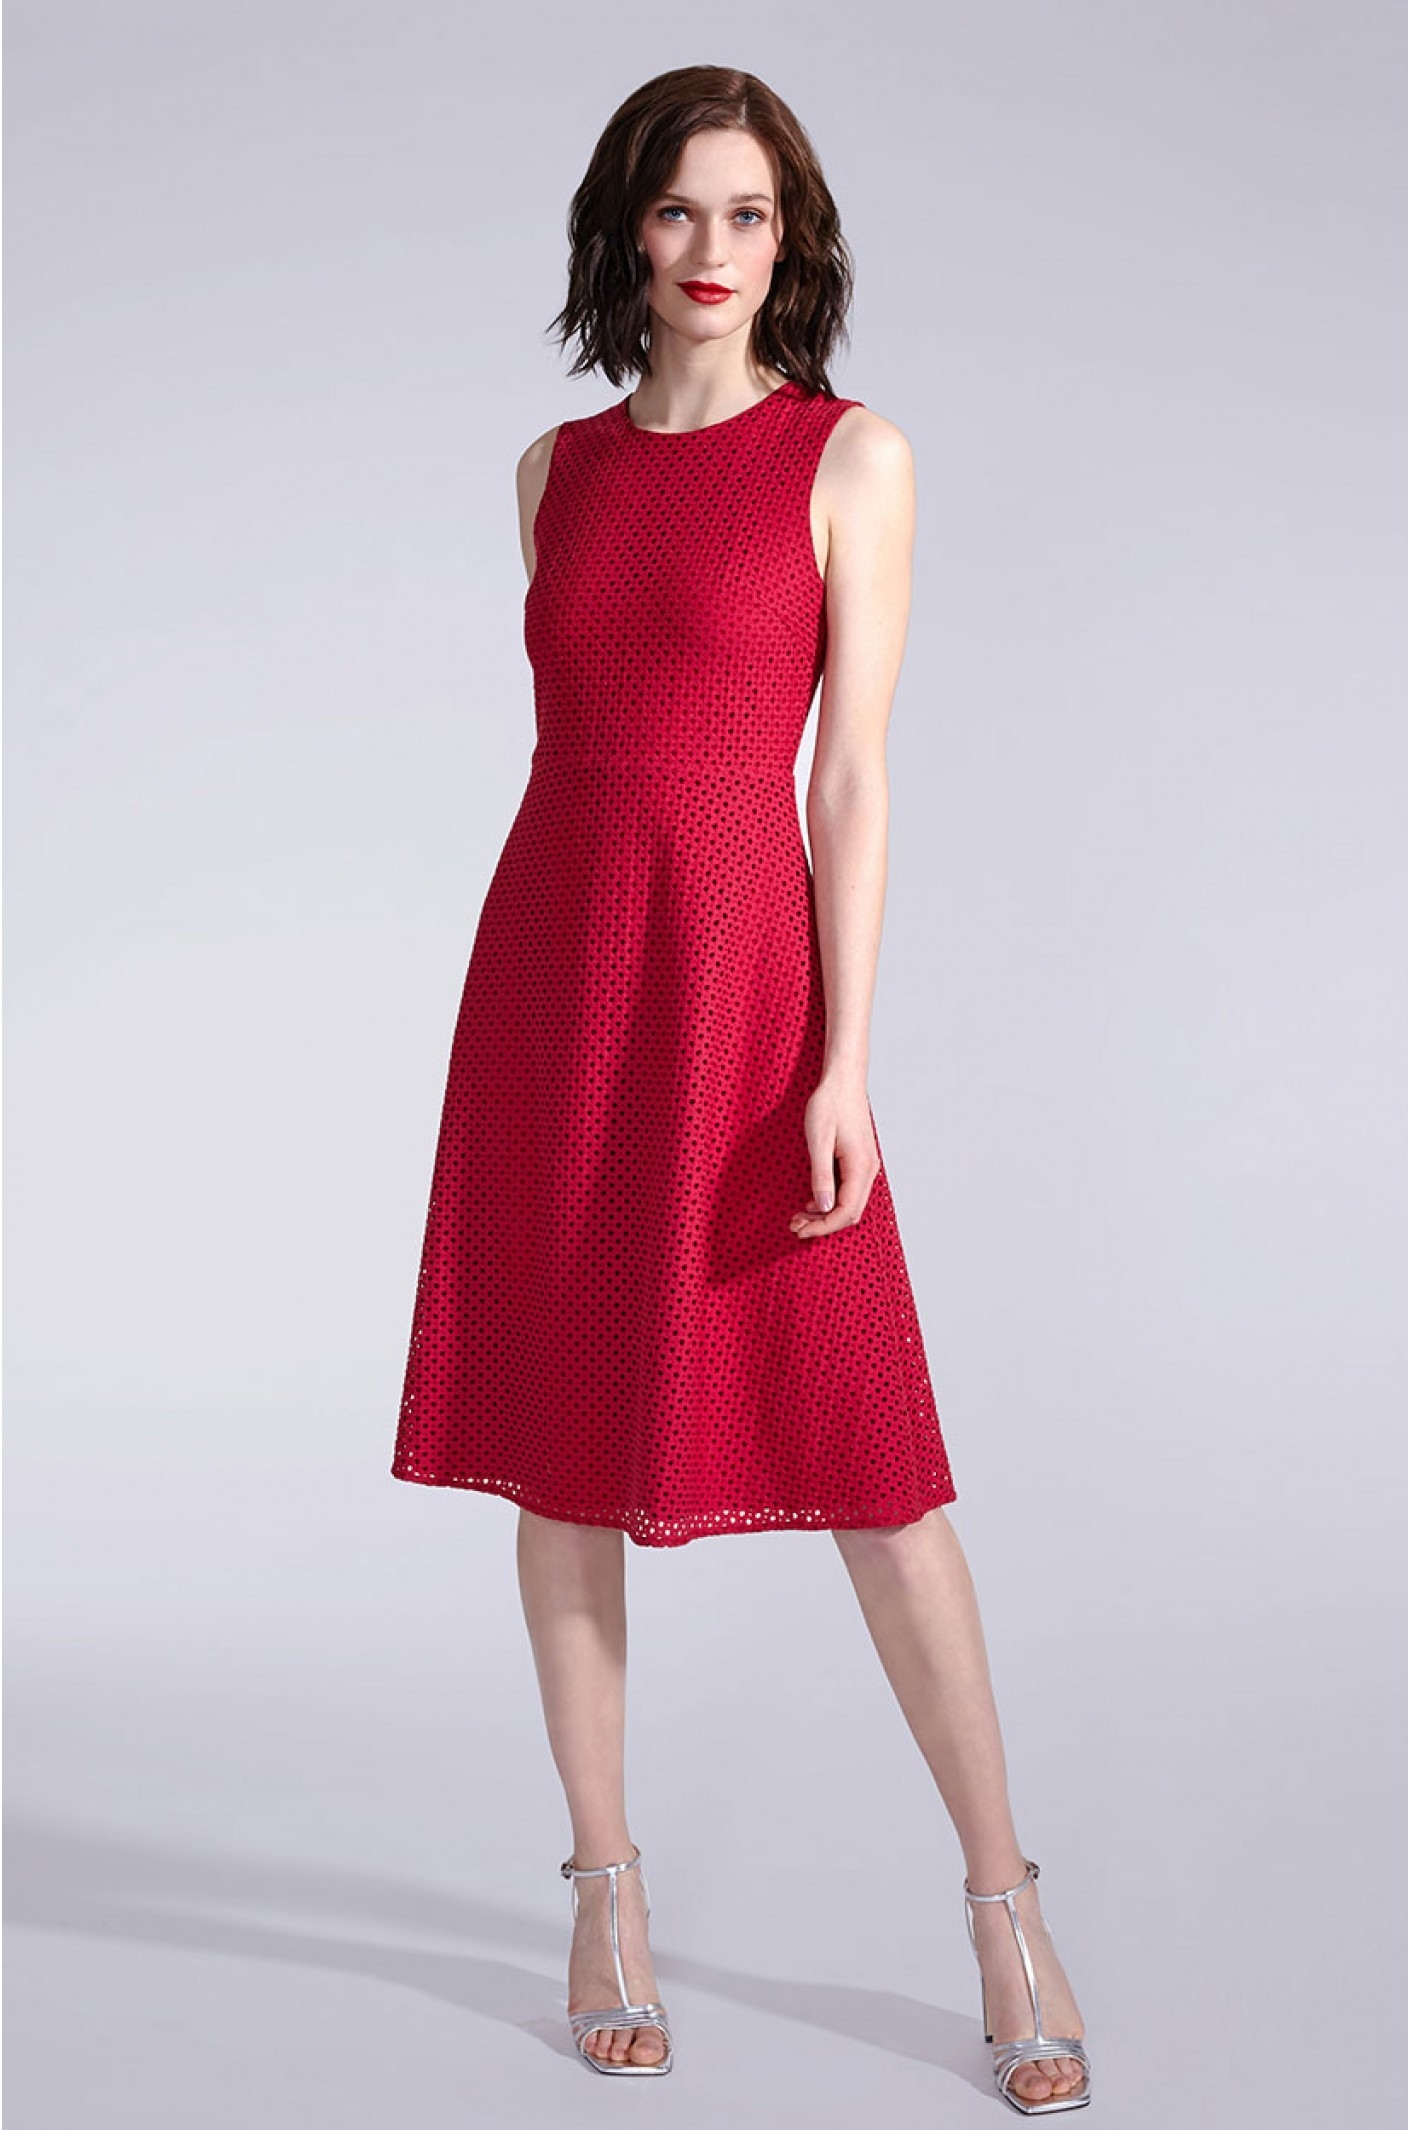 15 Leicht Elegante Kleider Midi Design15 Luxus Elegante Kleider Midi Boutique